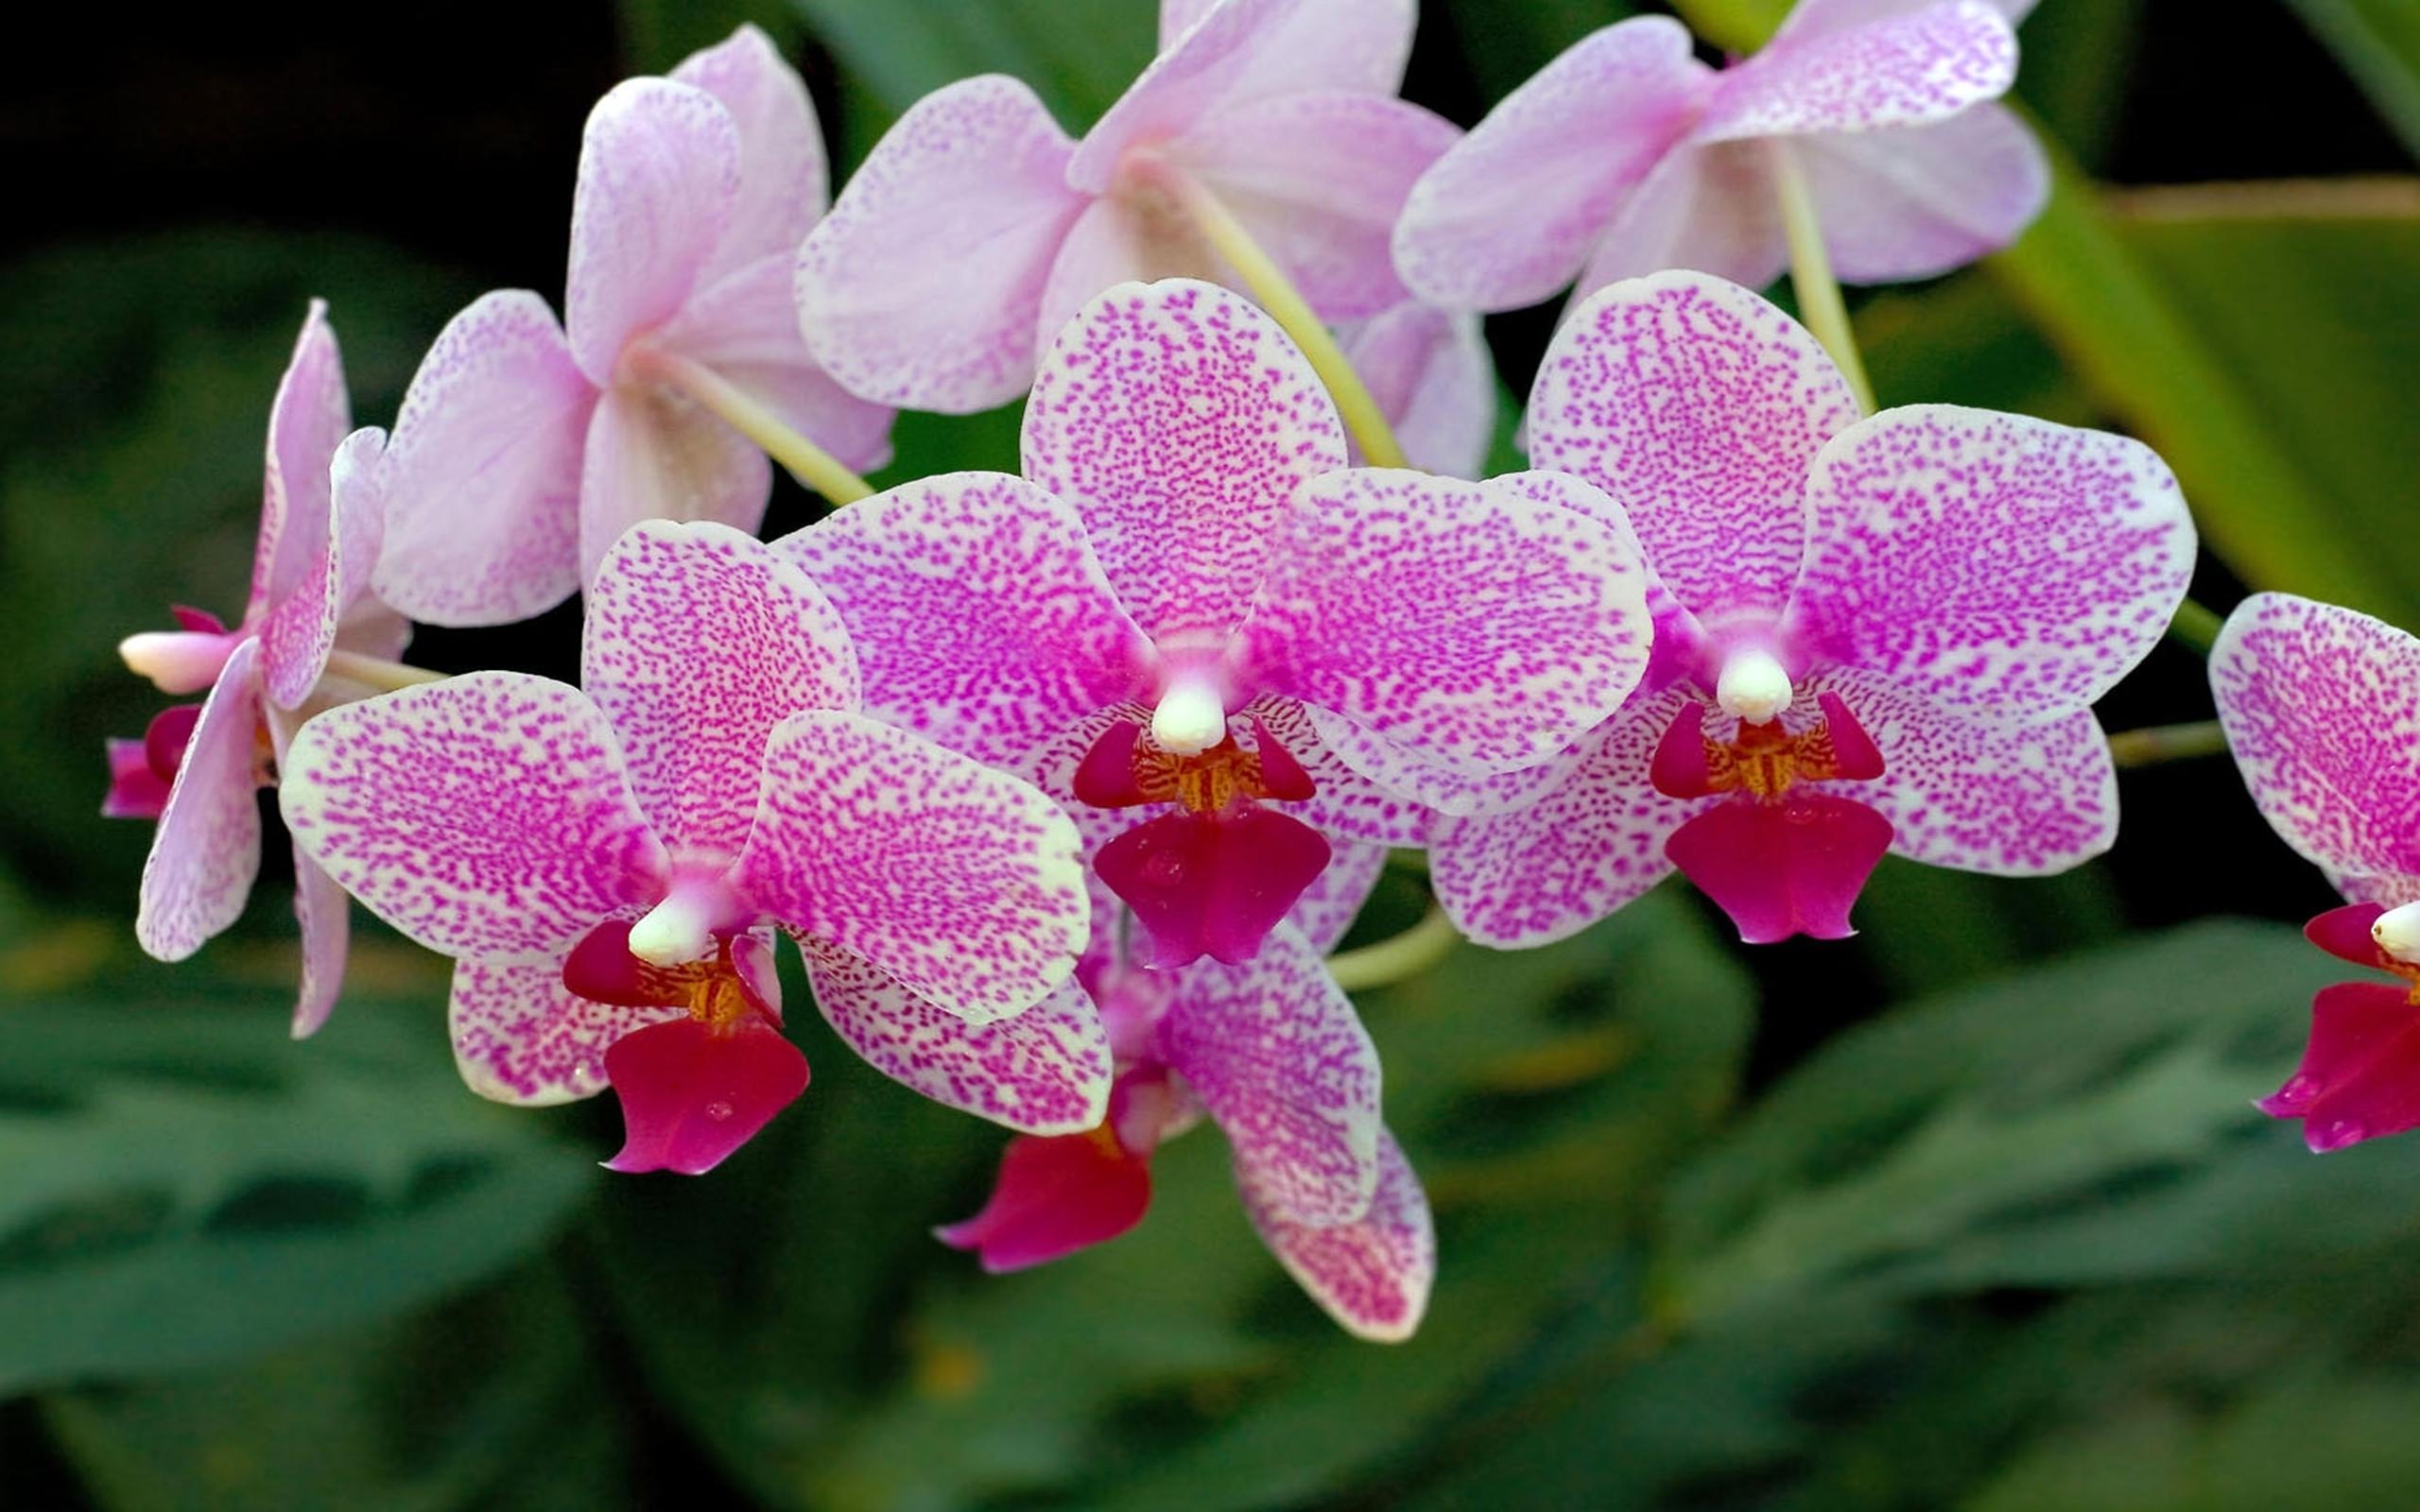 Shenzhen Nongke Orchid Free Download